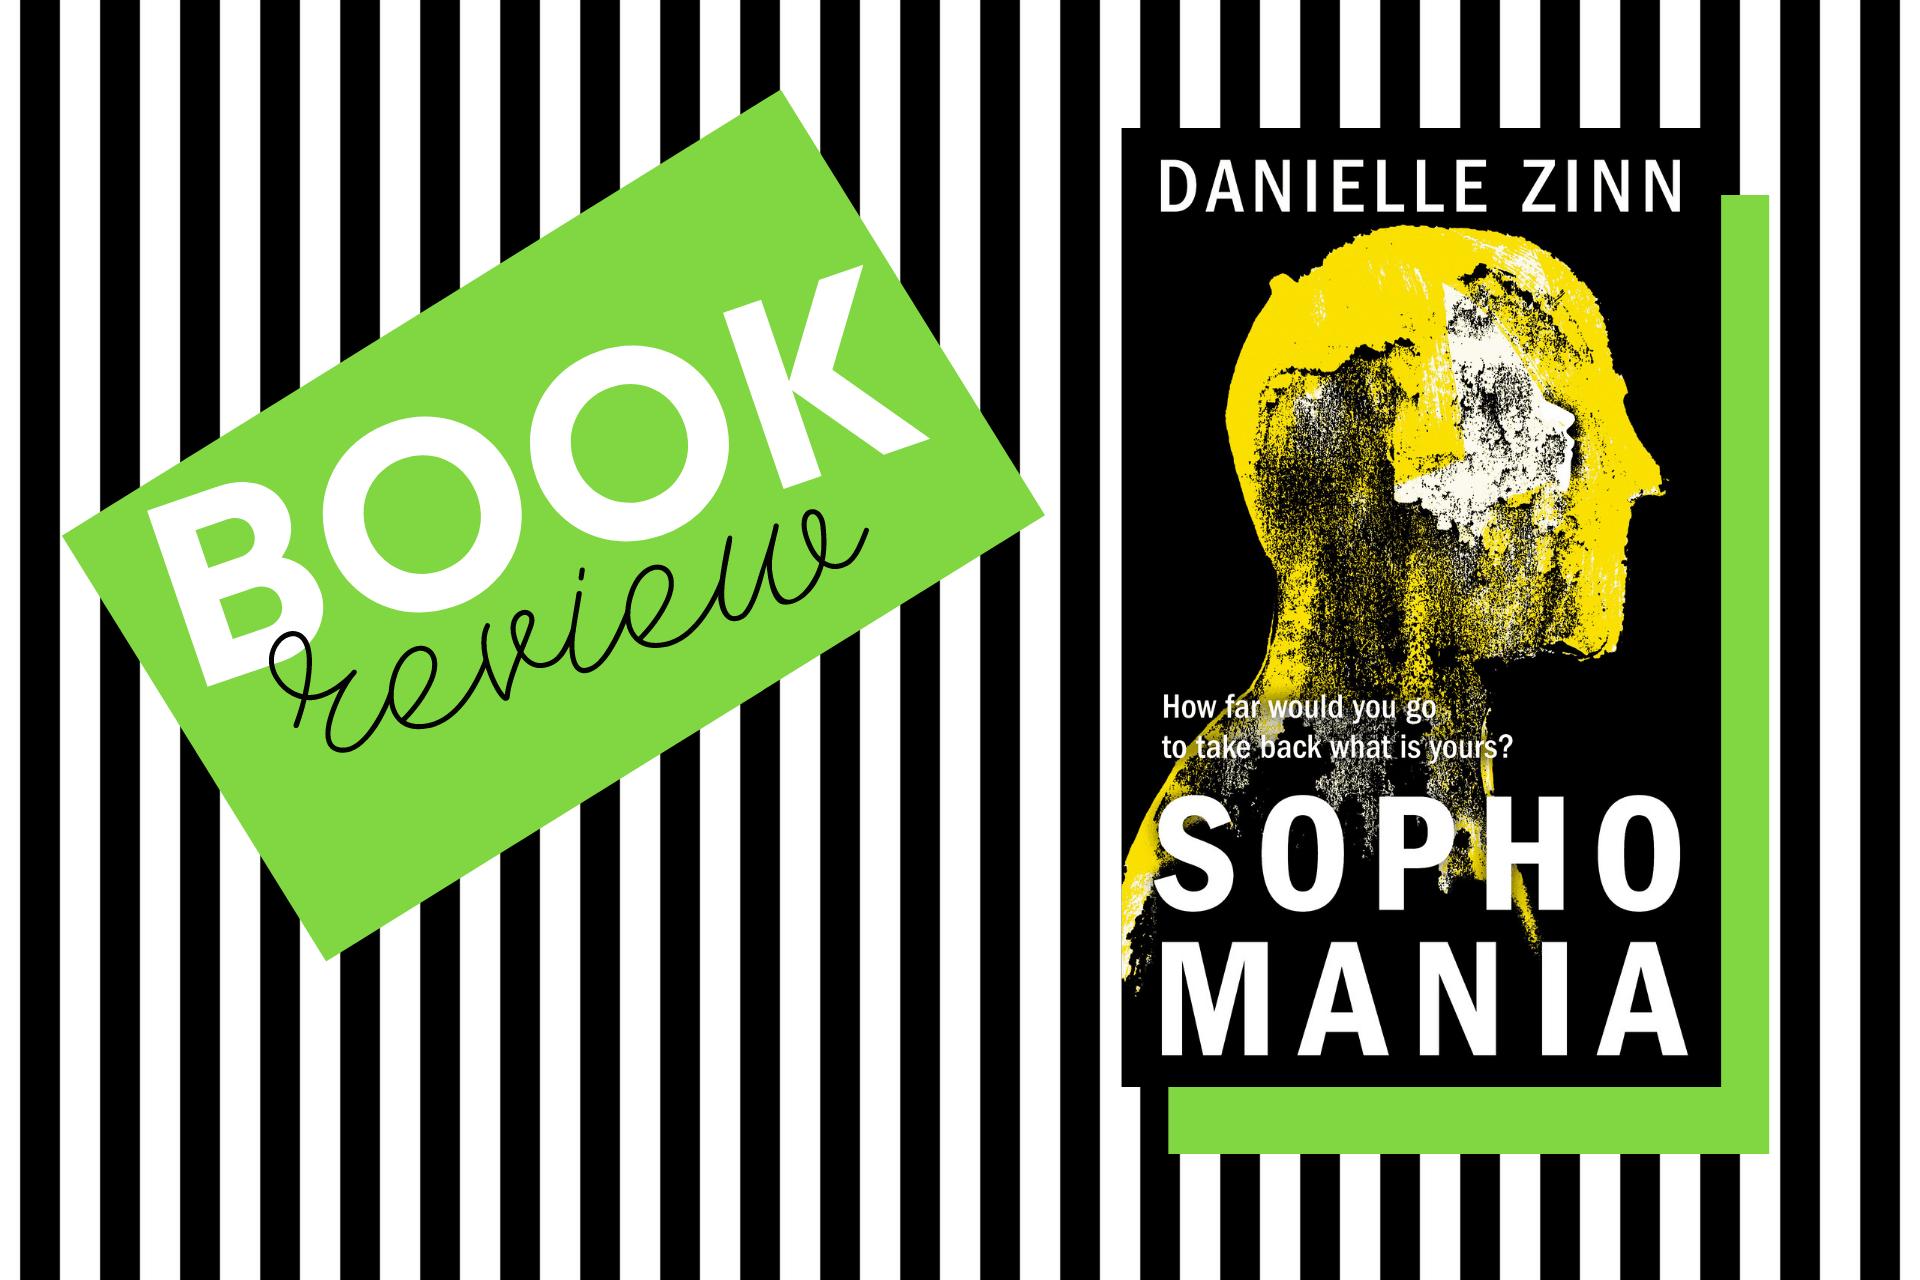 The cover of Sophomania by Danielle Zinn